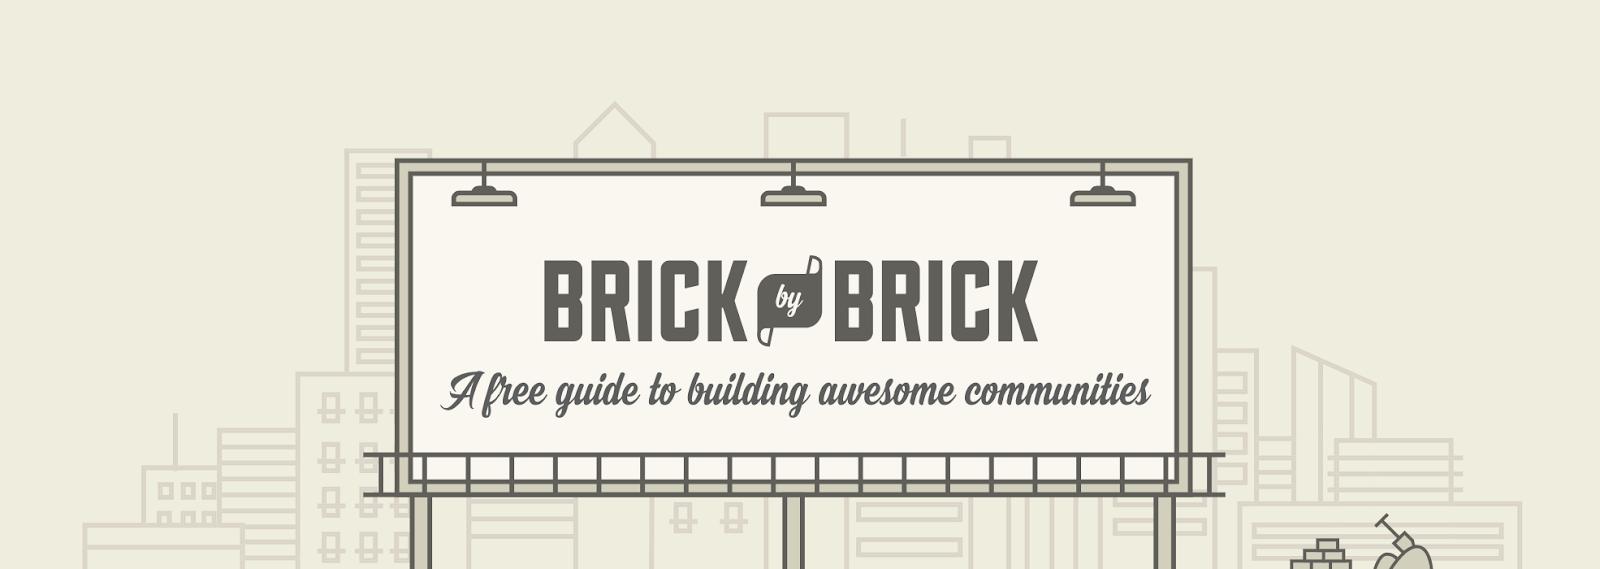 Free business ebook #8: Brick by Brick